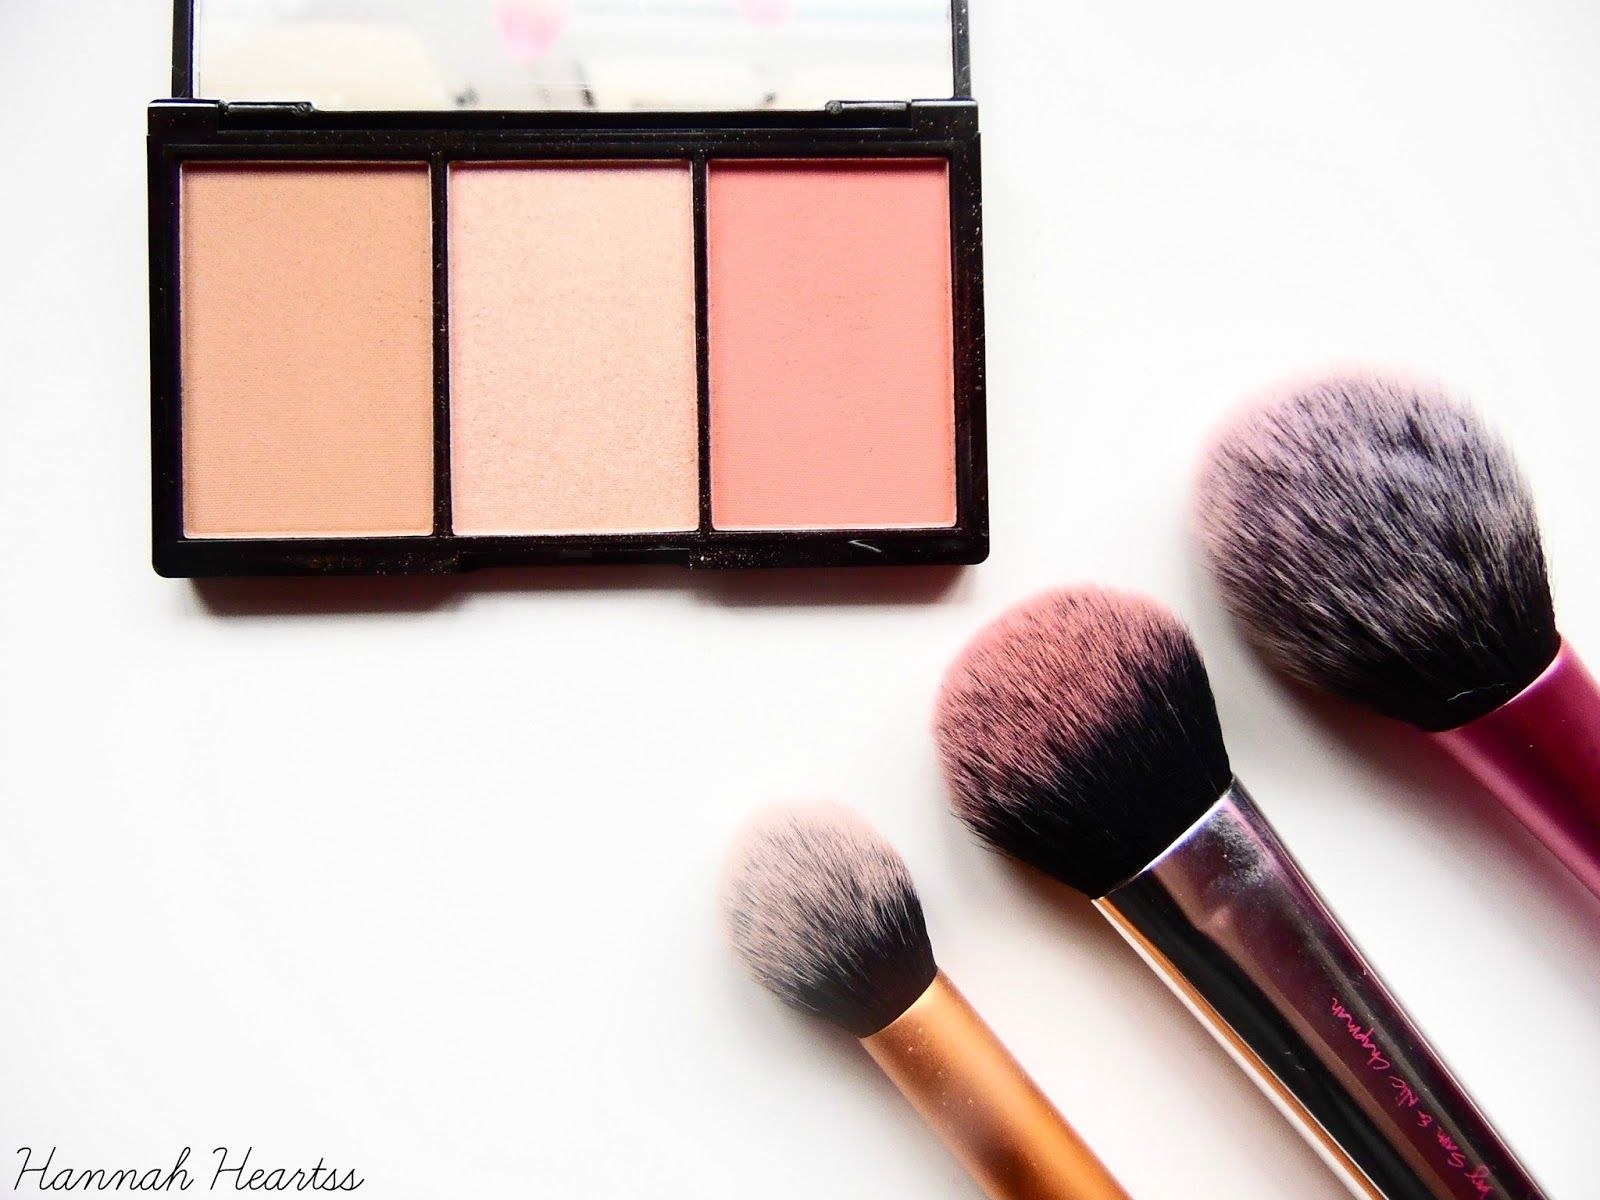 Makeup Revolution Iconic Blush, Bronze and Brighten